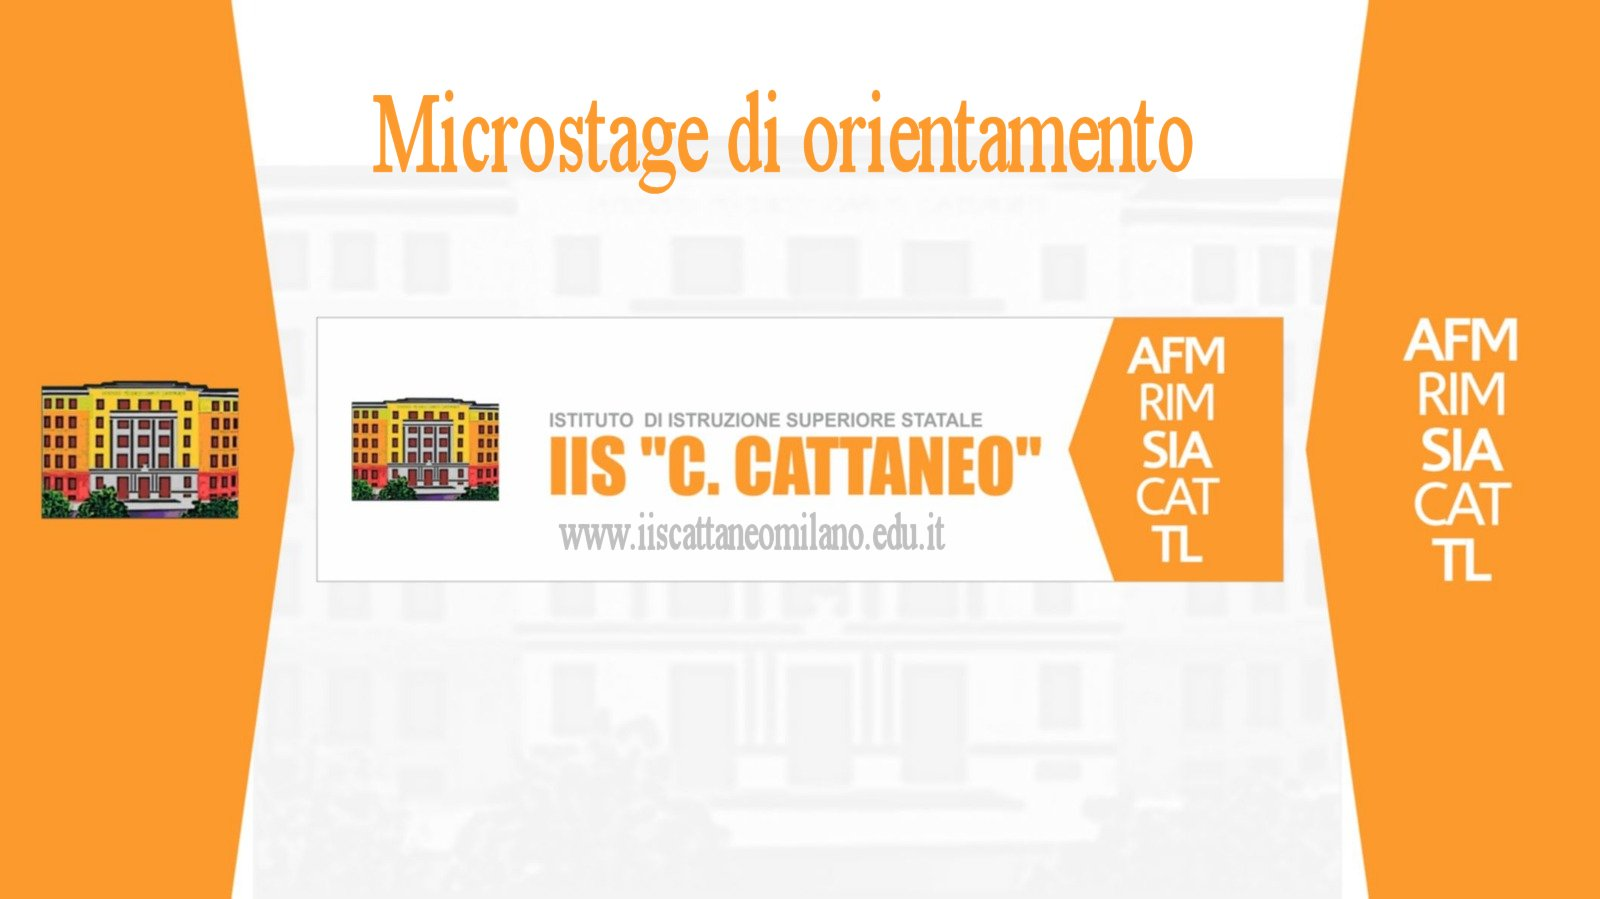 Microstage pomeridiano 16/12/2019